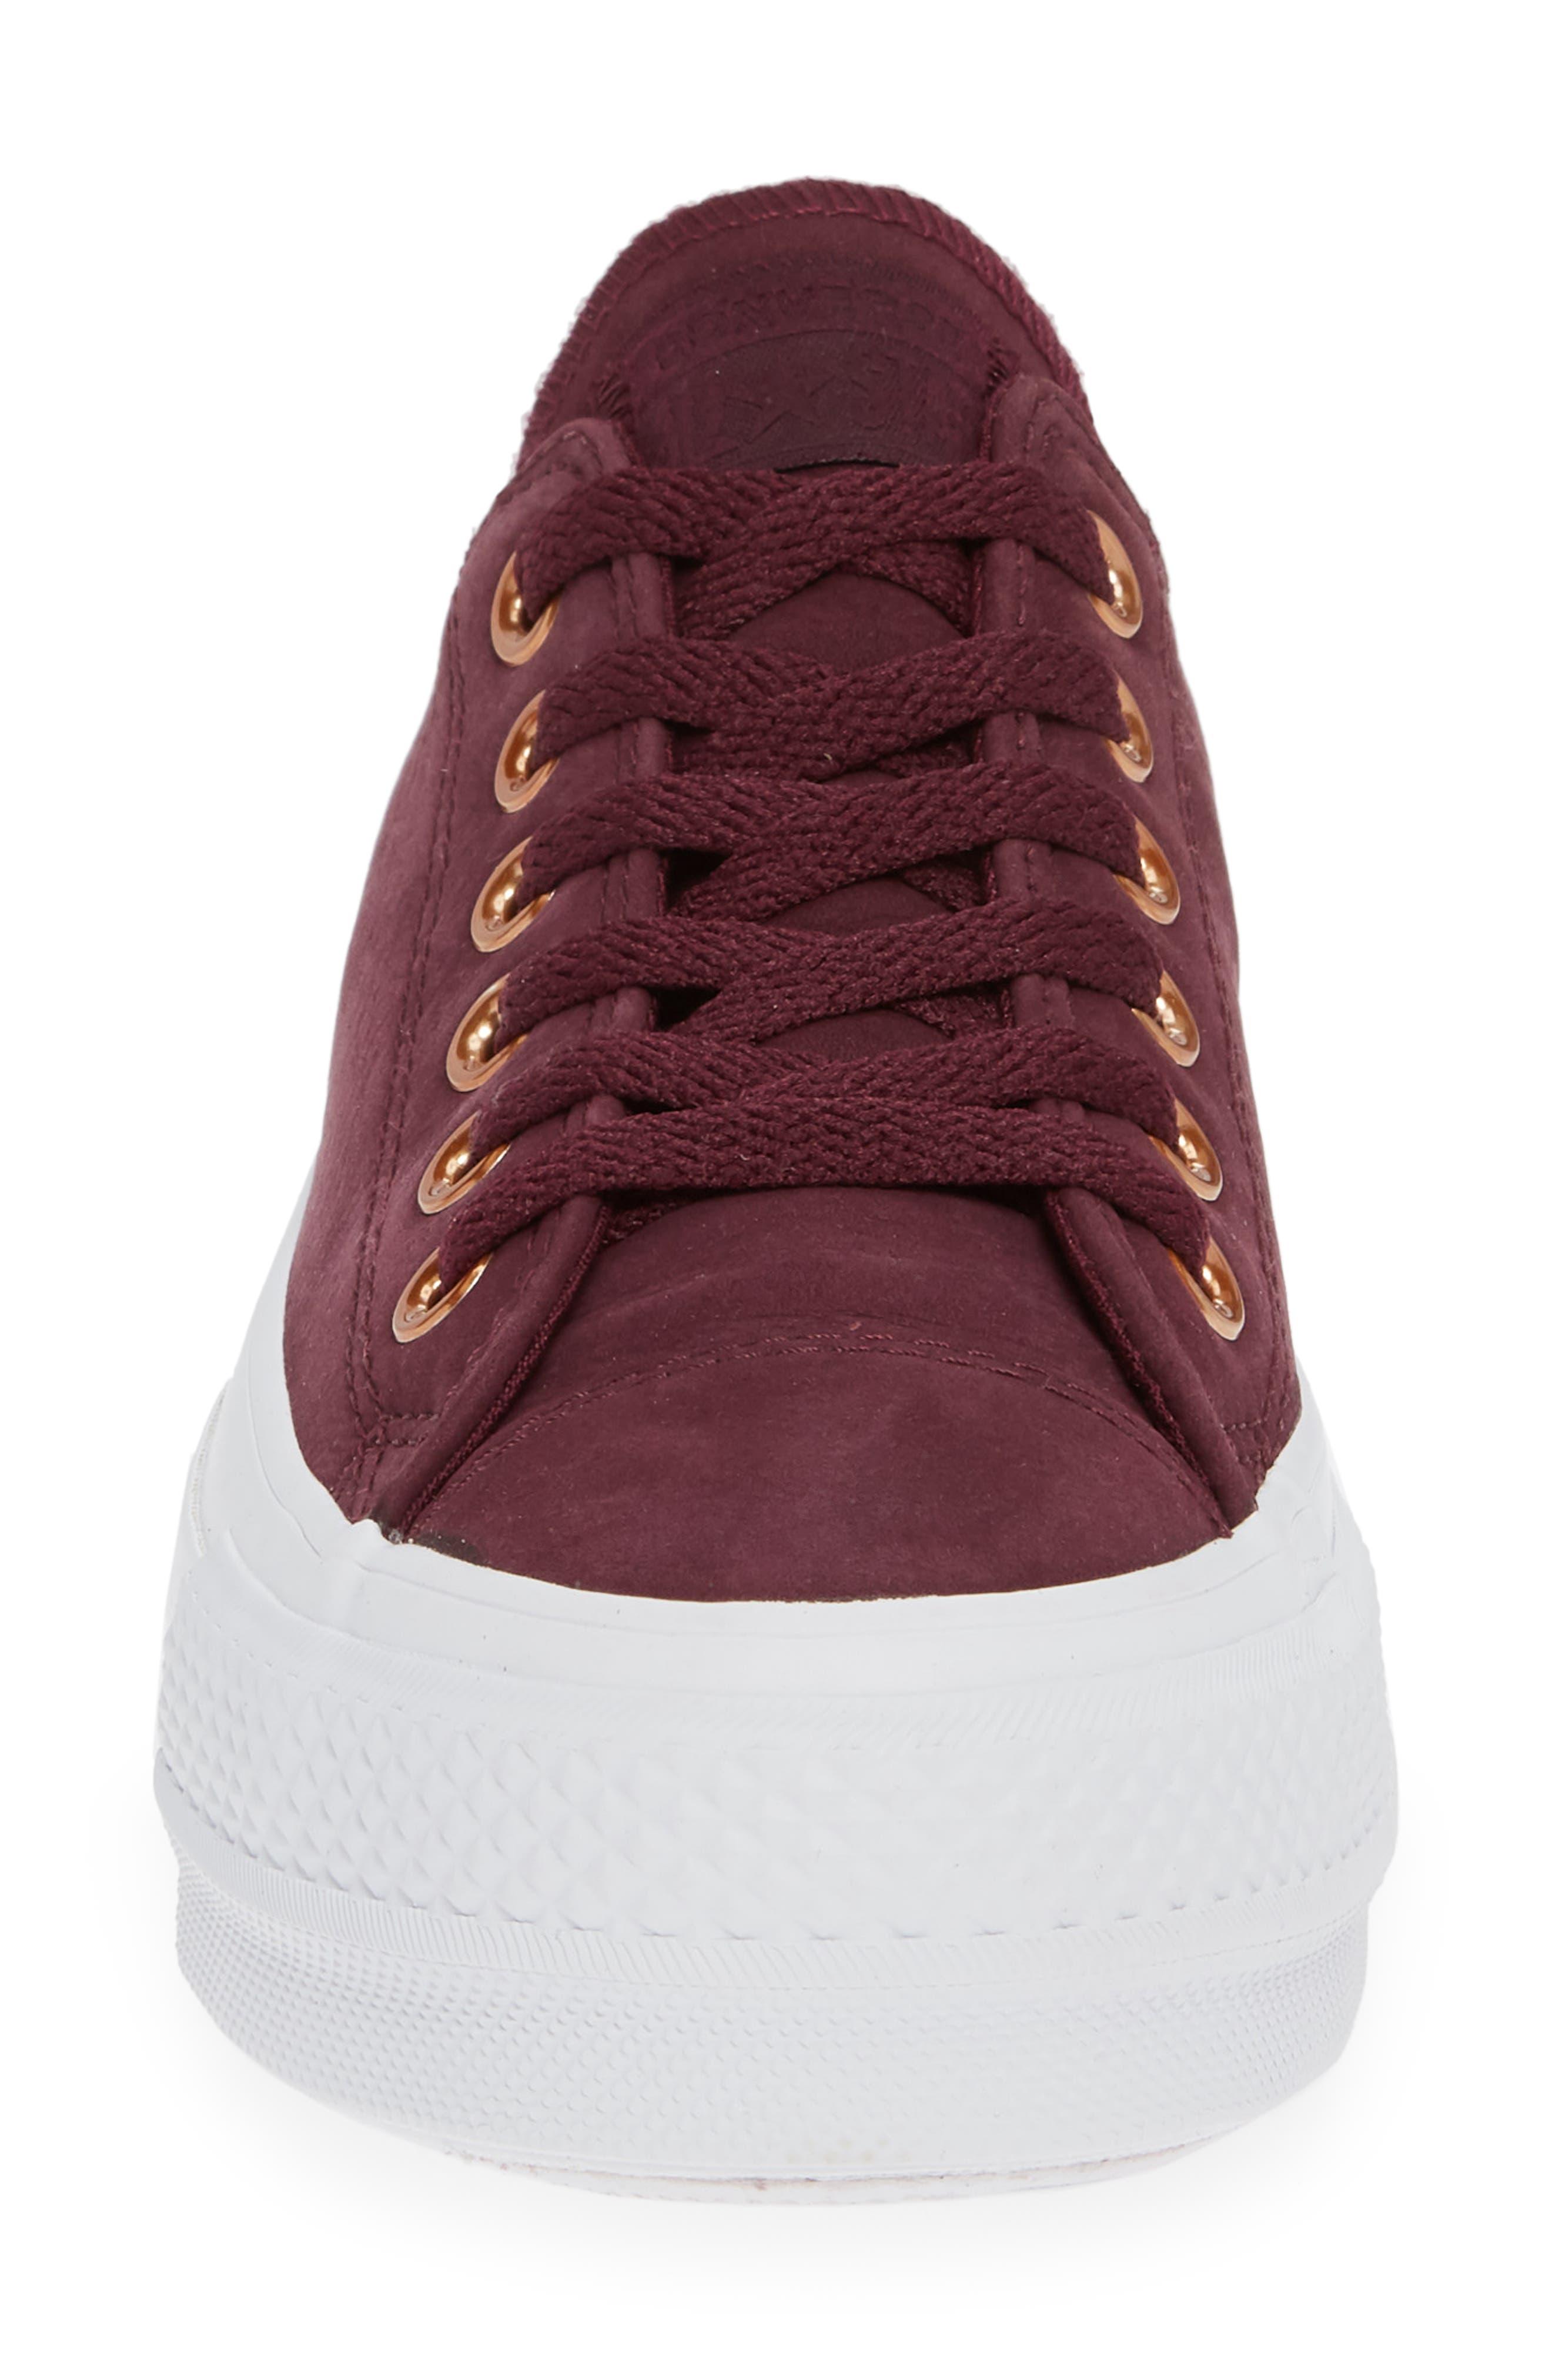 Chuck Taylor<sup>®</sup> All Star<sup>®</sup> Platform Sneaker,                             Alternate thumbnail 5, color,                             Dark Sangria Nubuck